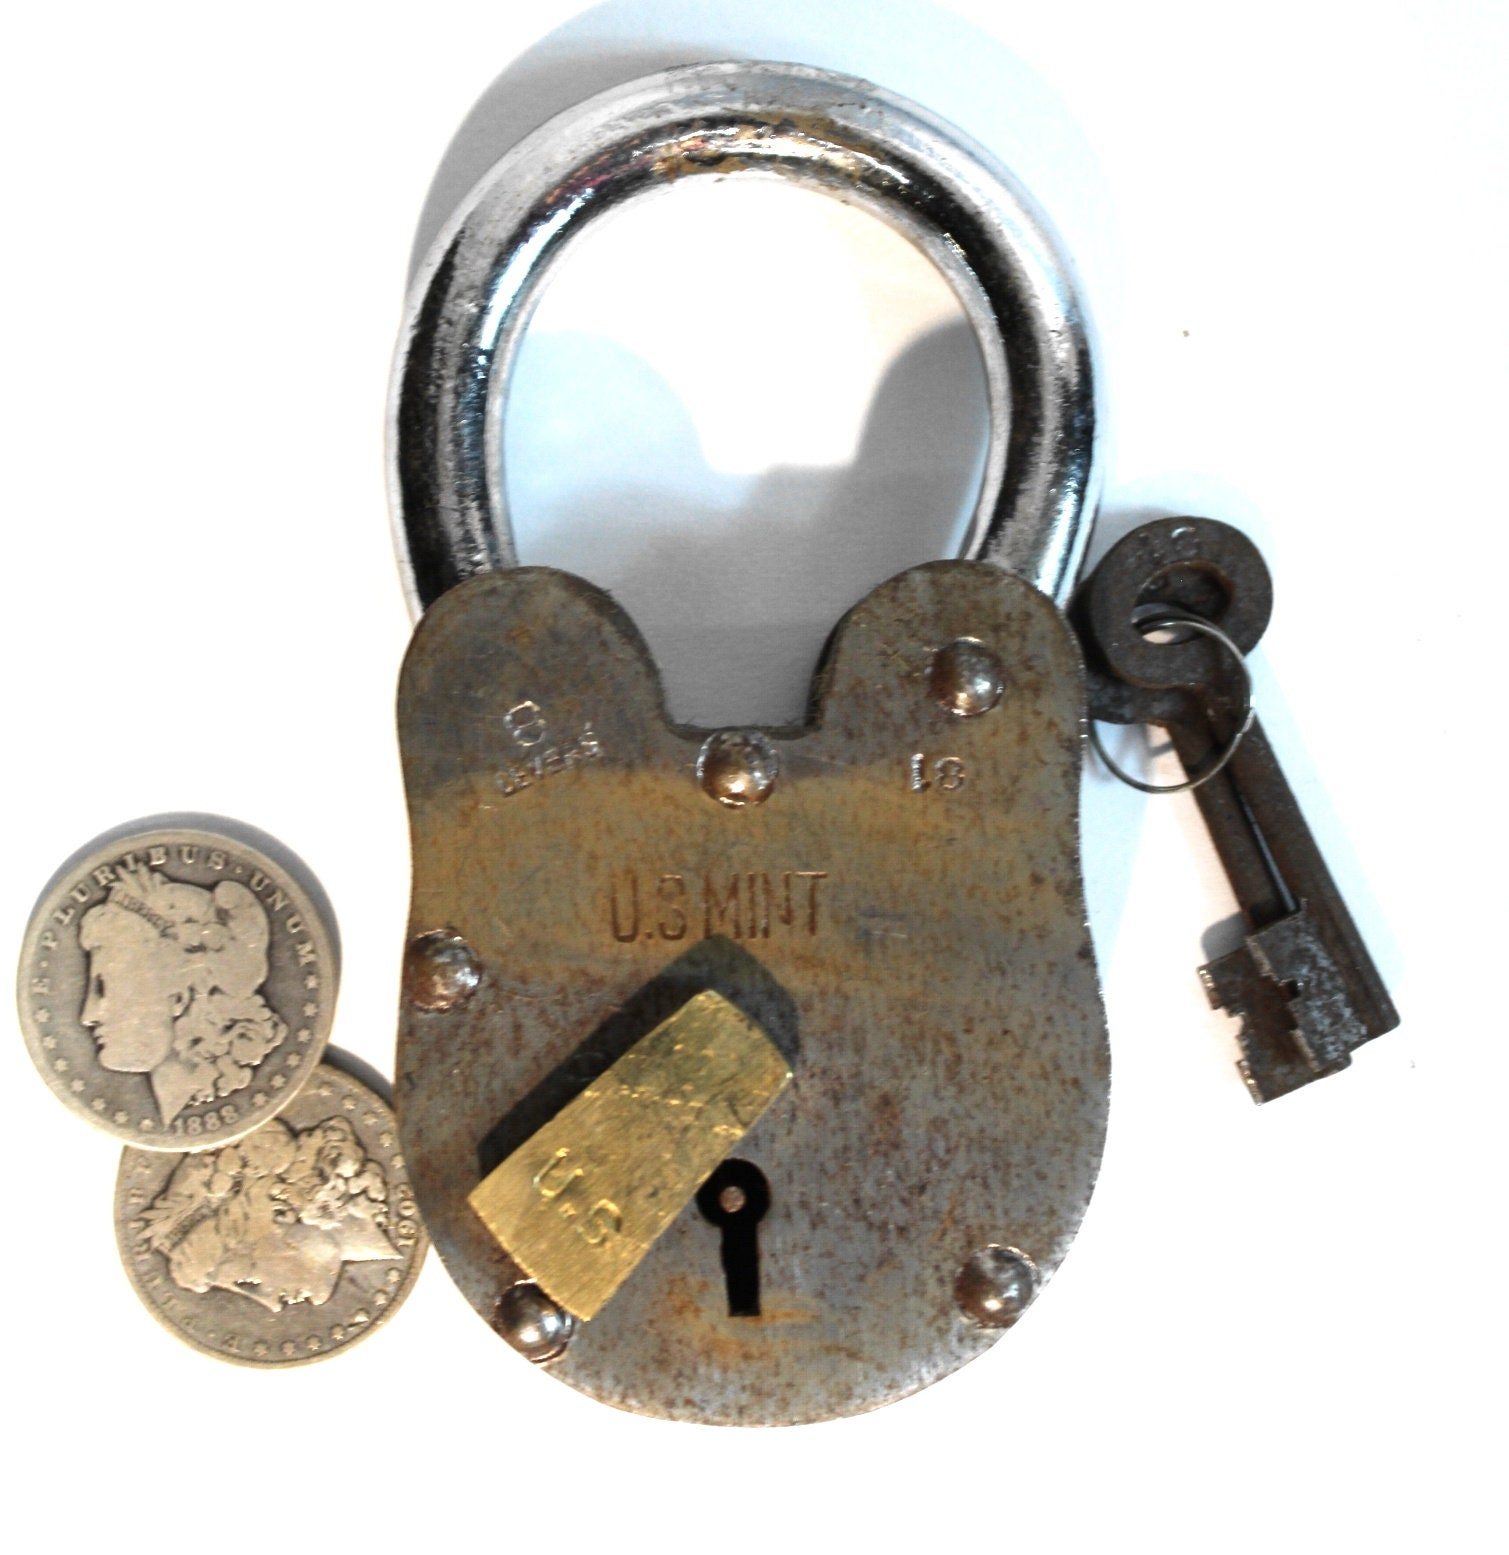 Wine Cellar Padlock Vintage Antique Style Treasure Chest Lock 2lbs 6″ Tall Rusty